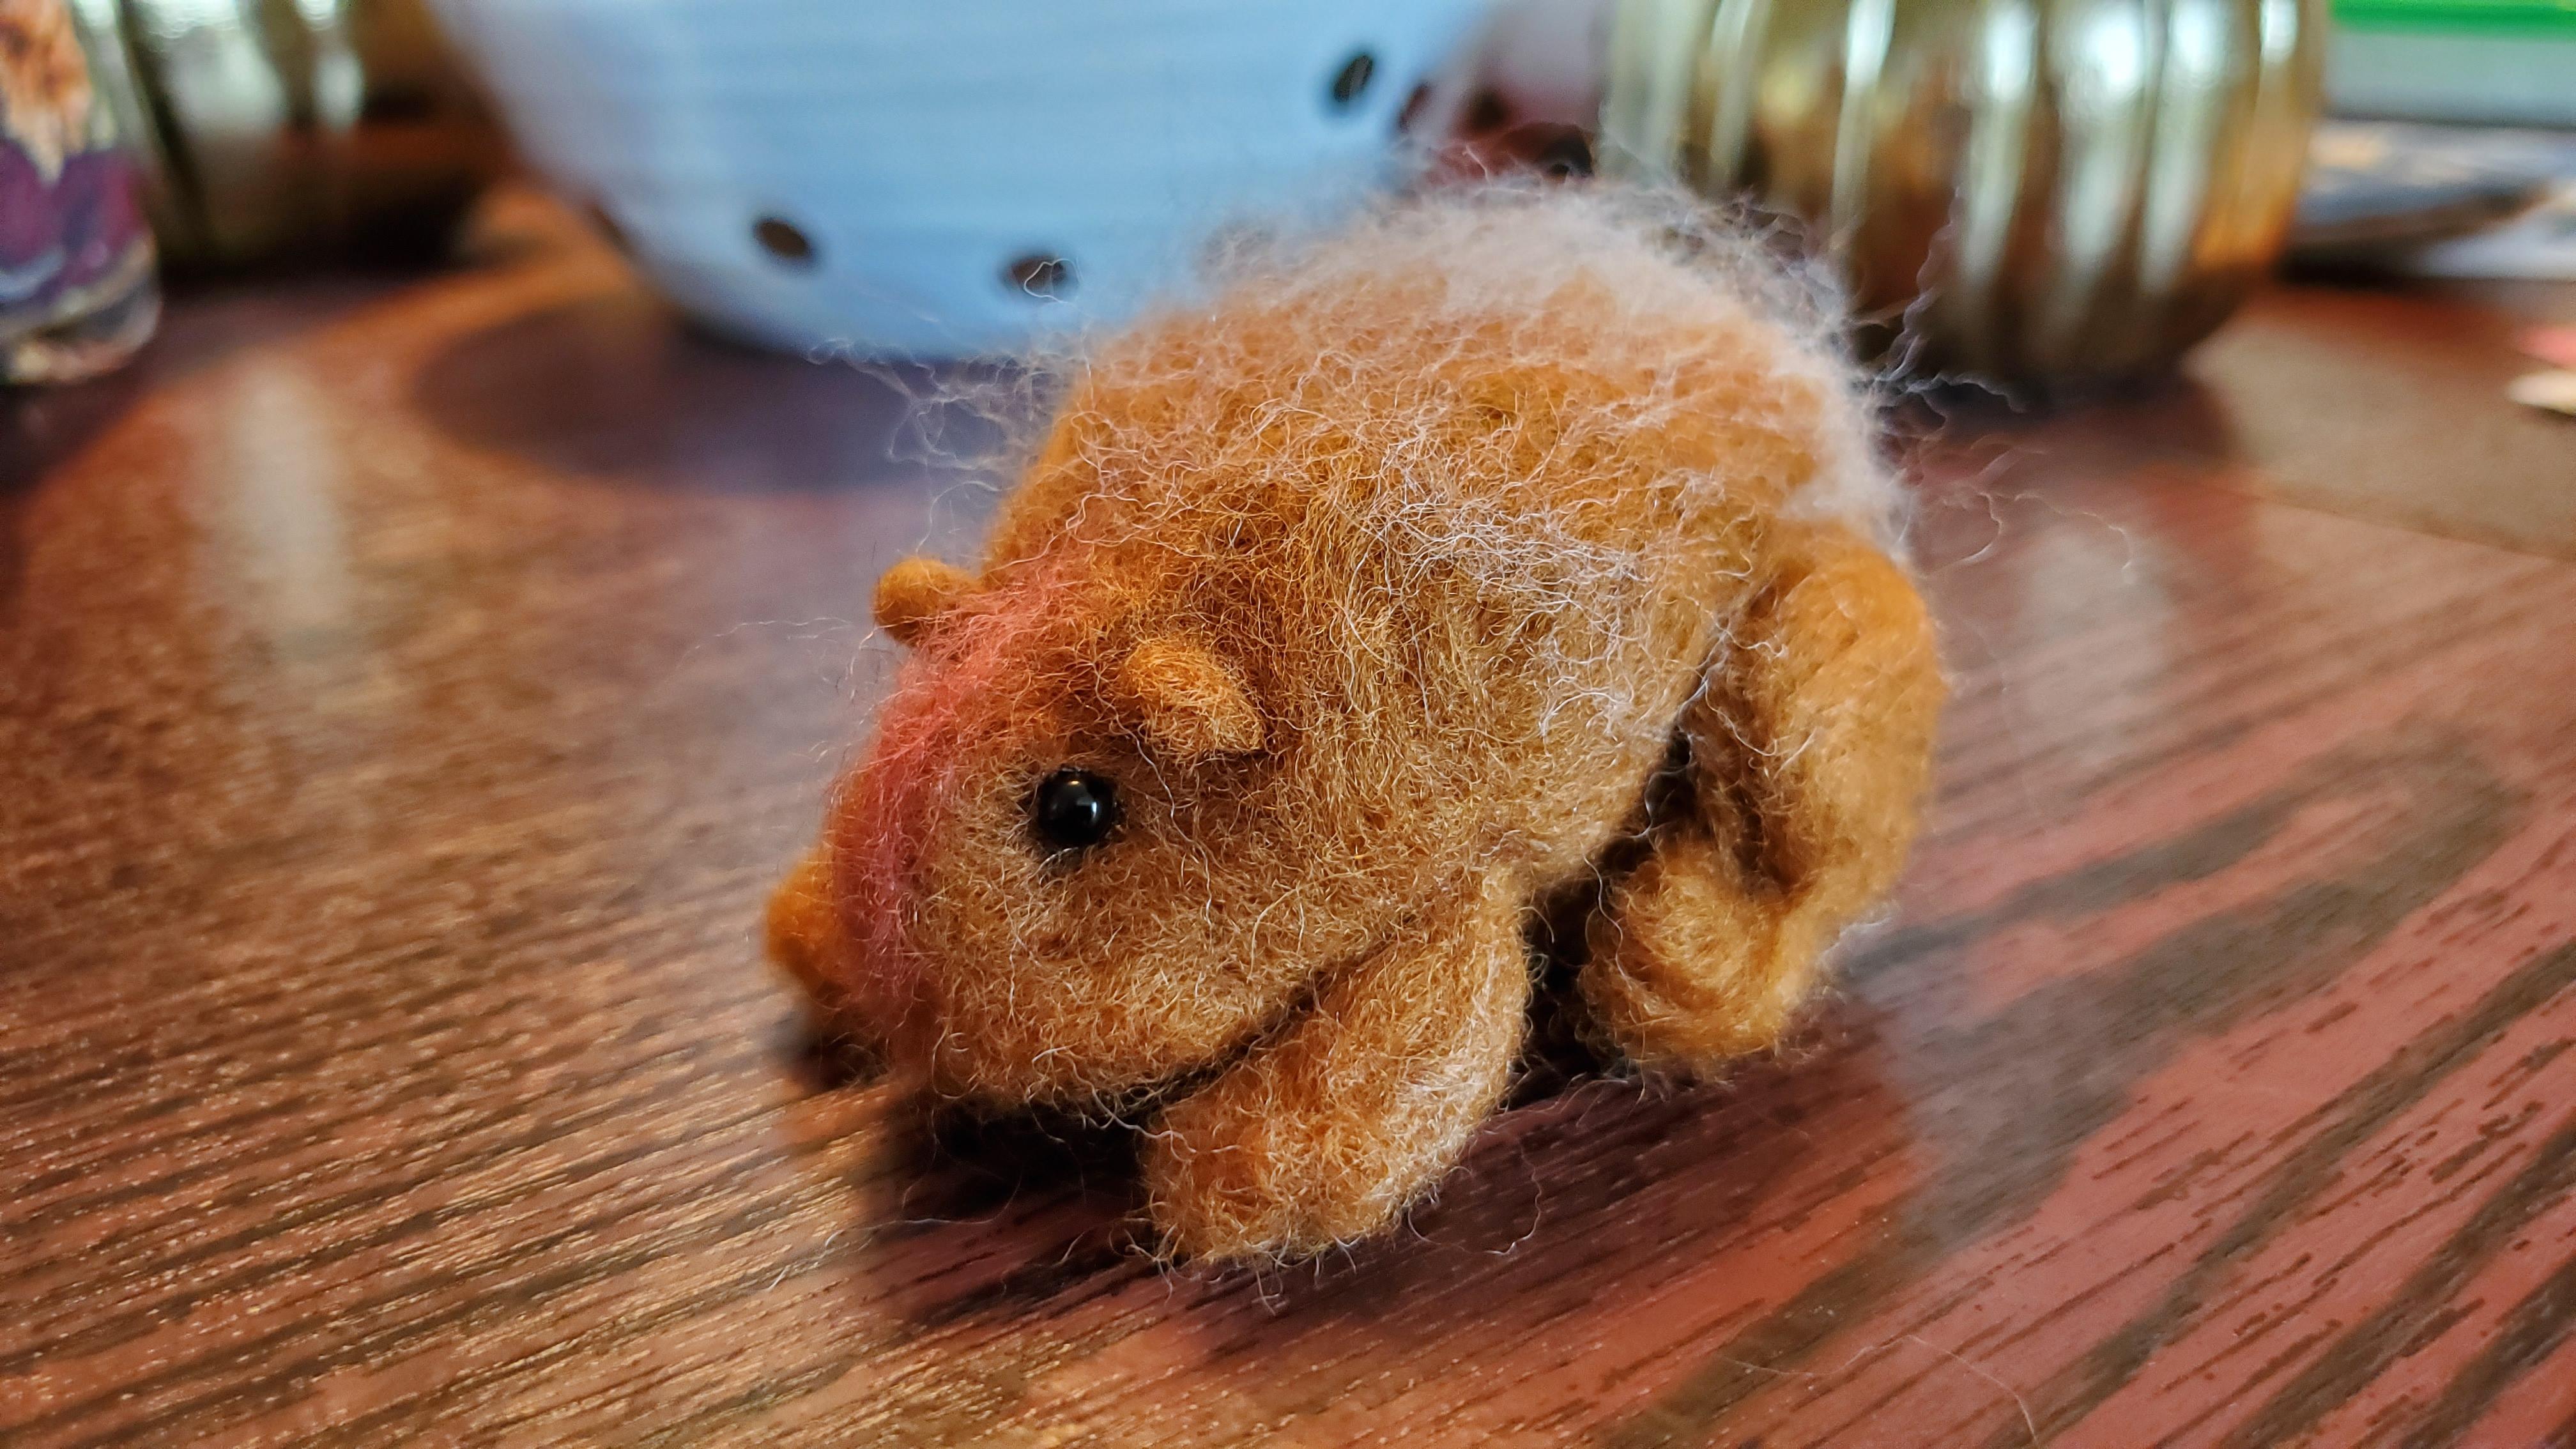 little felt porcupine with black bead eyes sitting on a table